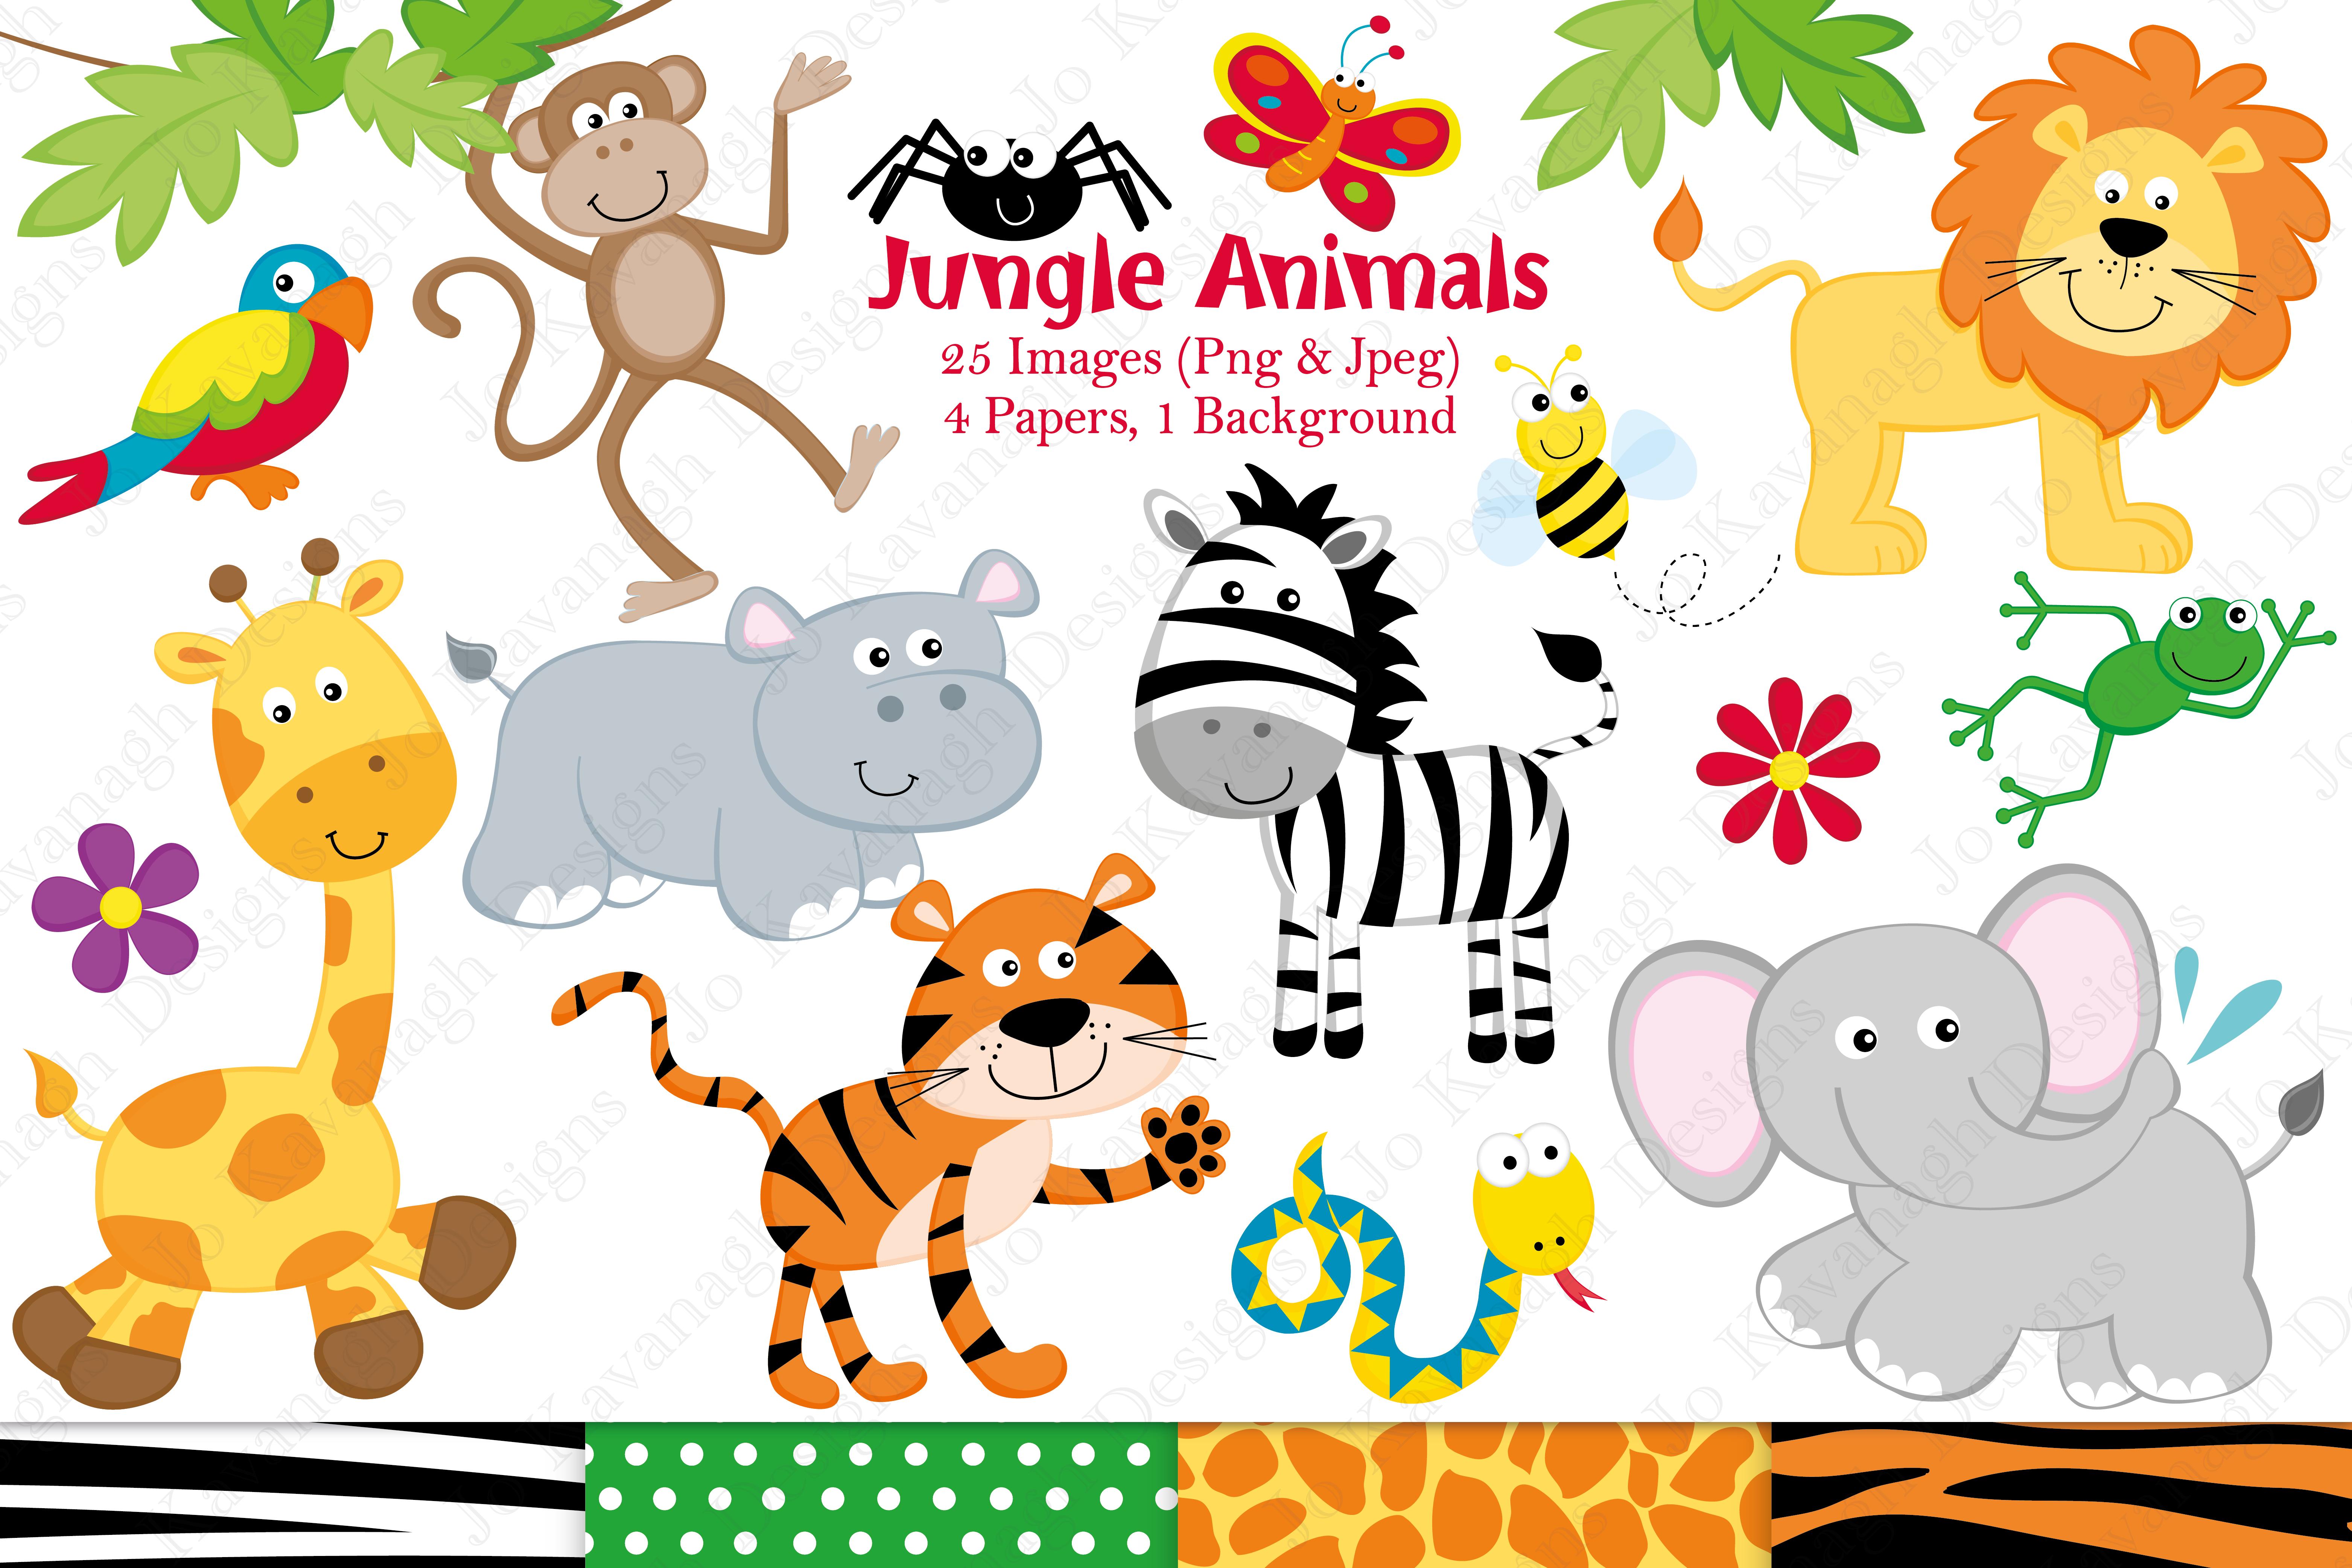 jungle animals clipart graphics illustrations paper designs borders graphic illustration kavanagh jo message designer follow webstockreview thehungryjpeg